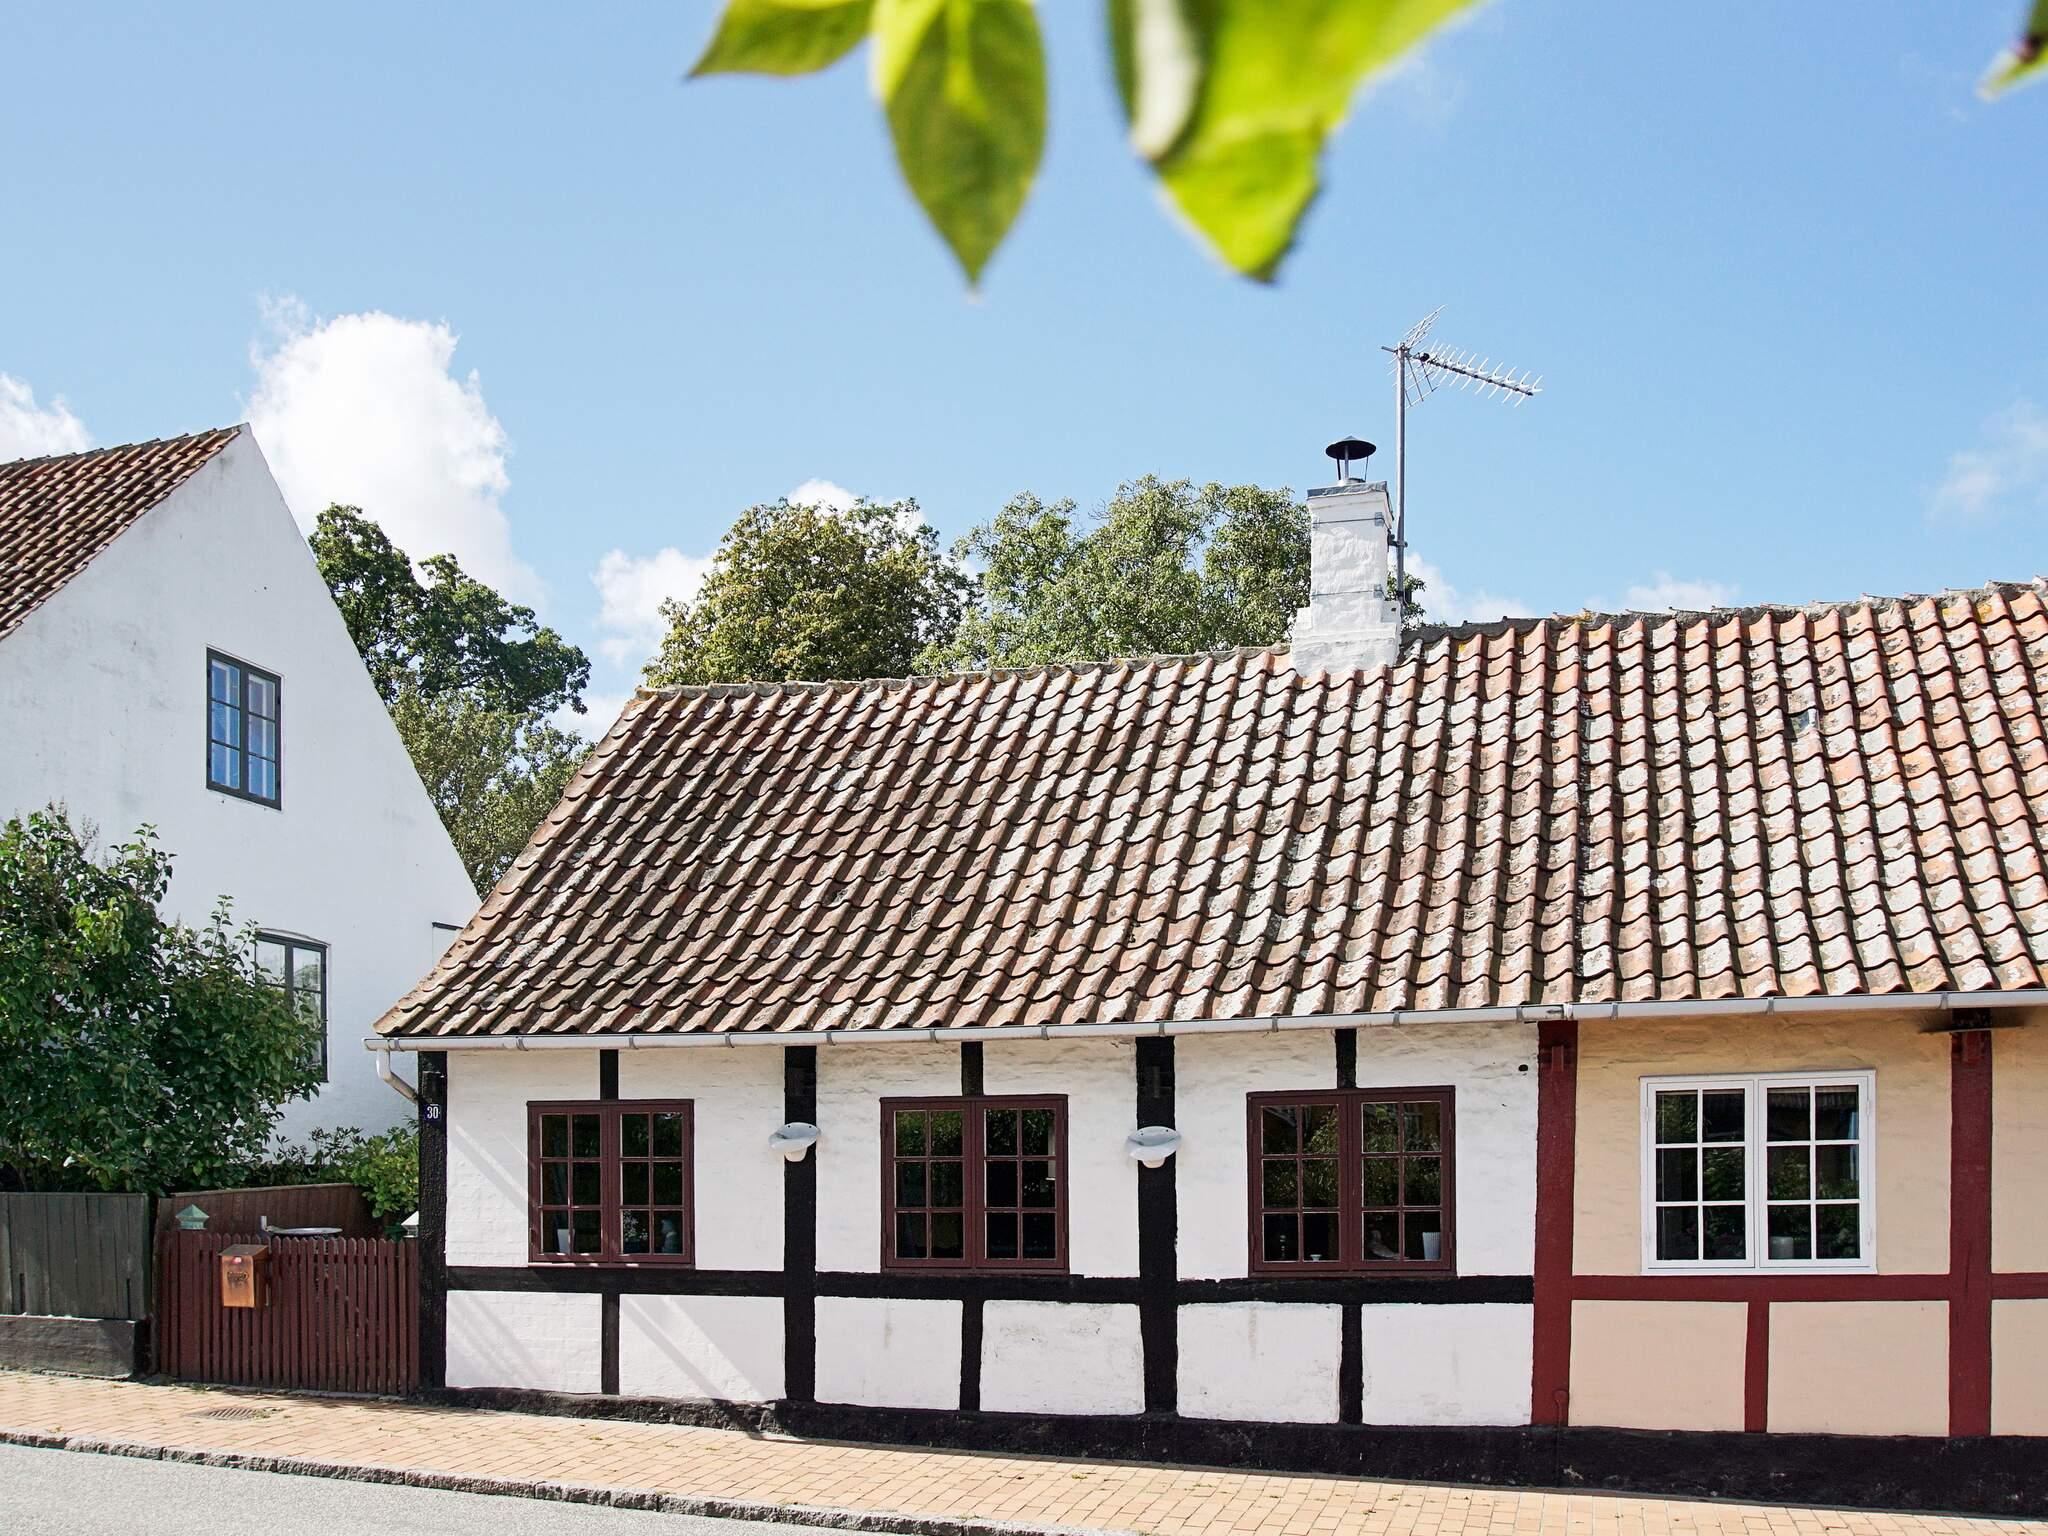 Maison de vacances Svaneke (2523728), Svaneke, , Bornholm, Danemark, image 18